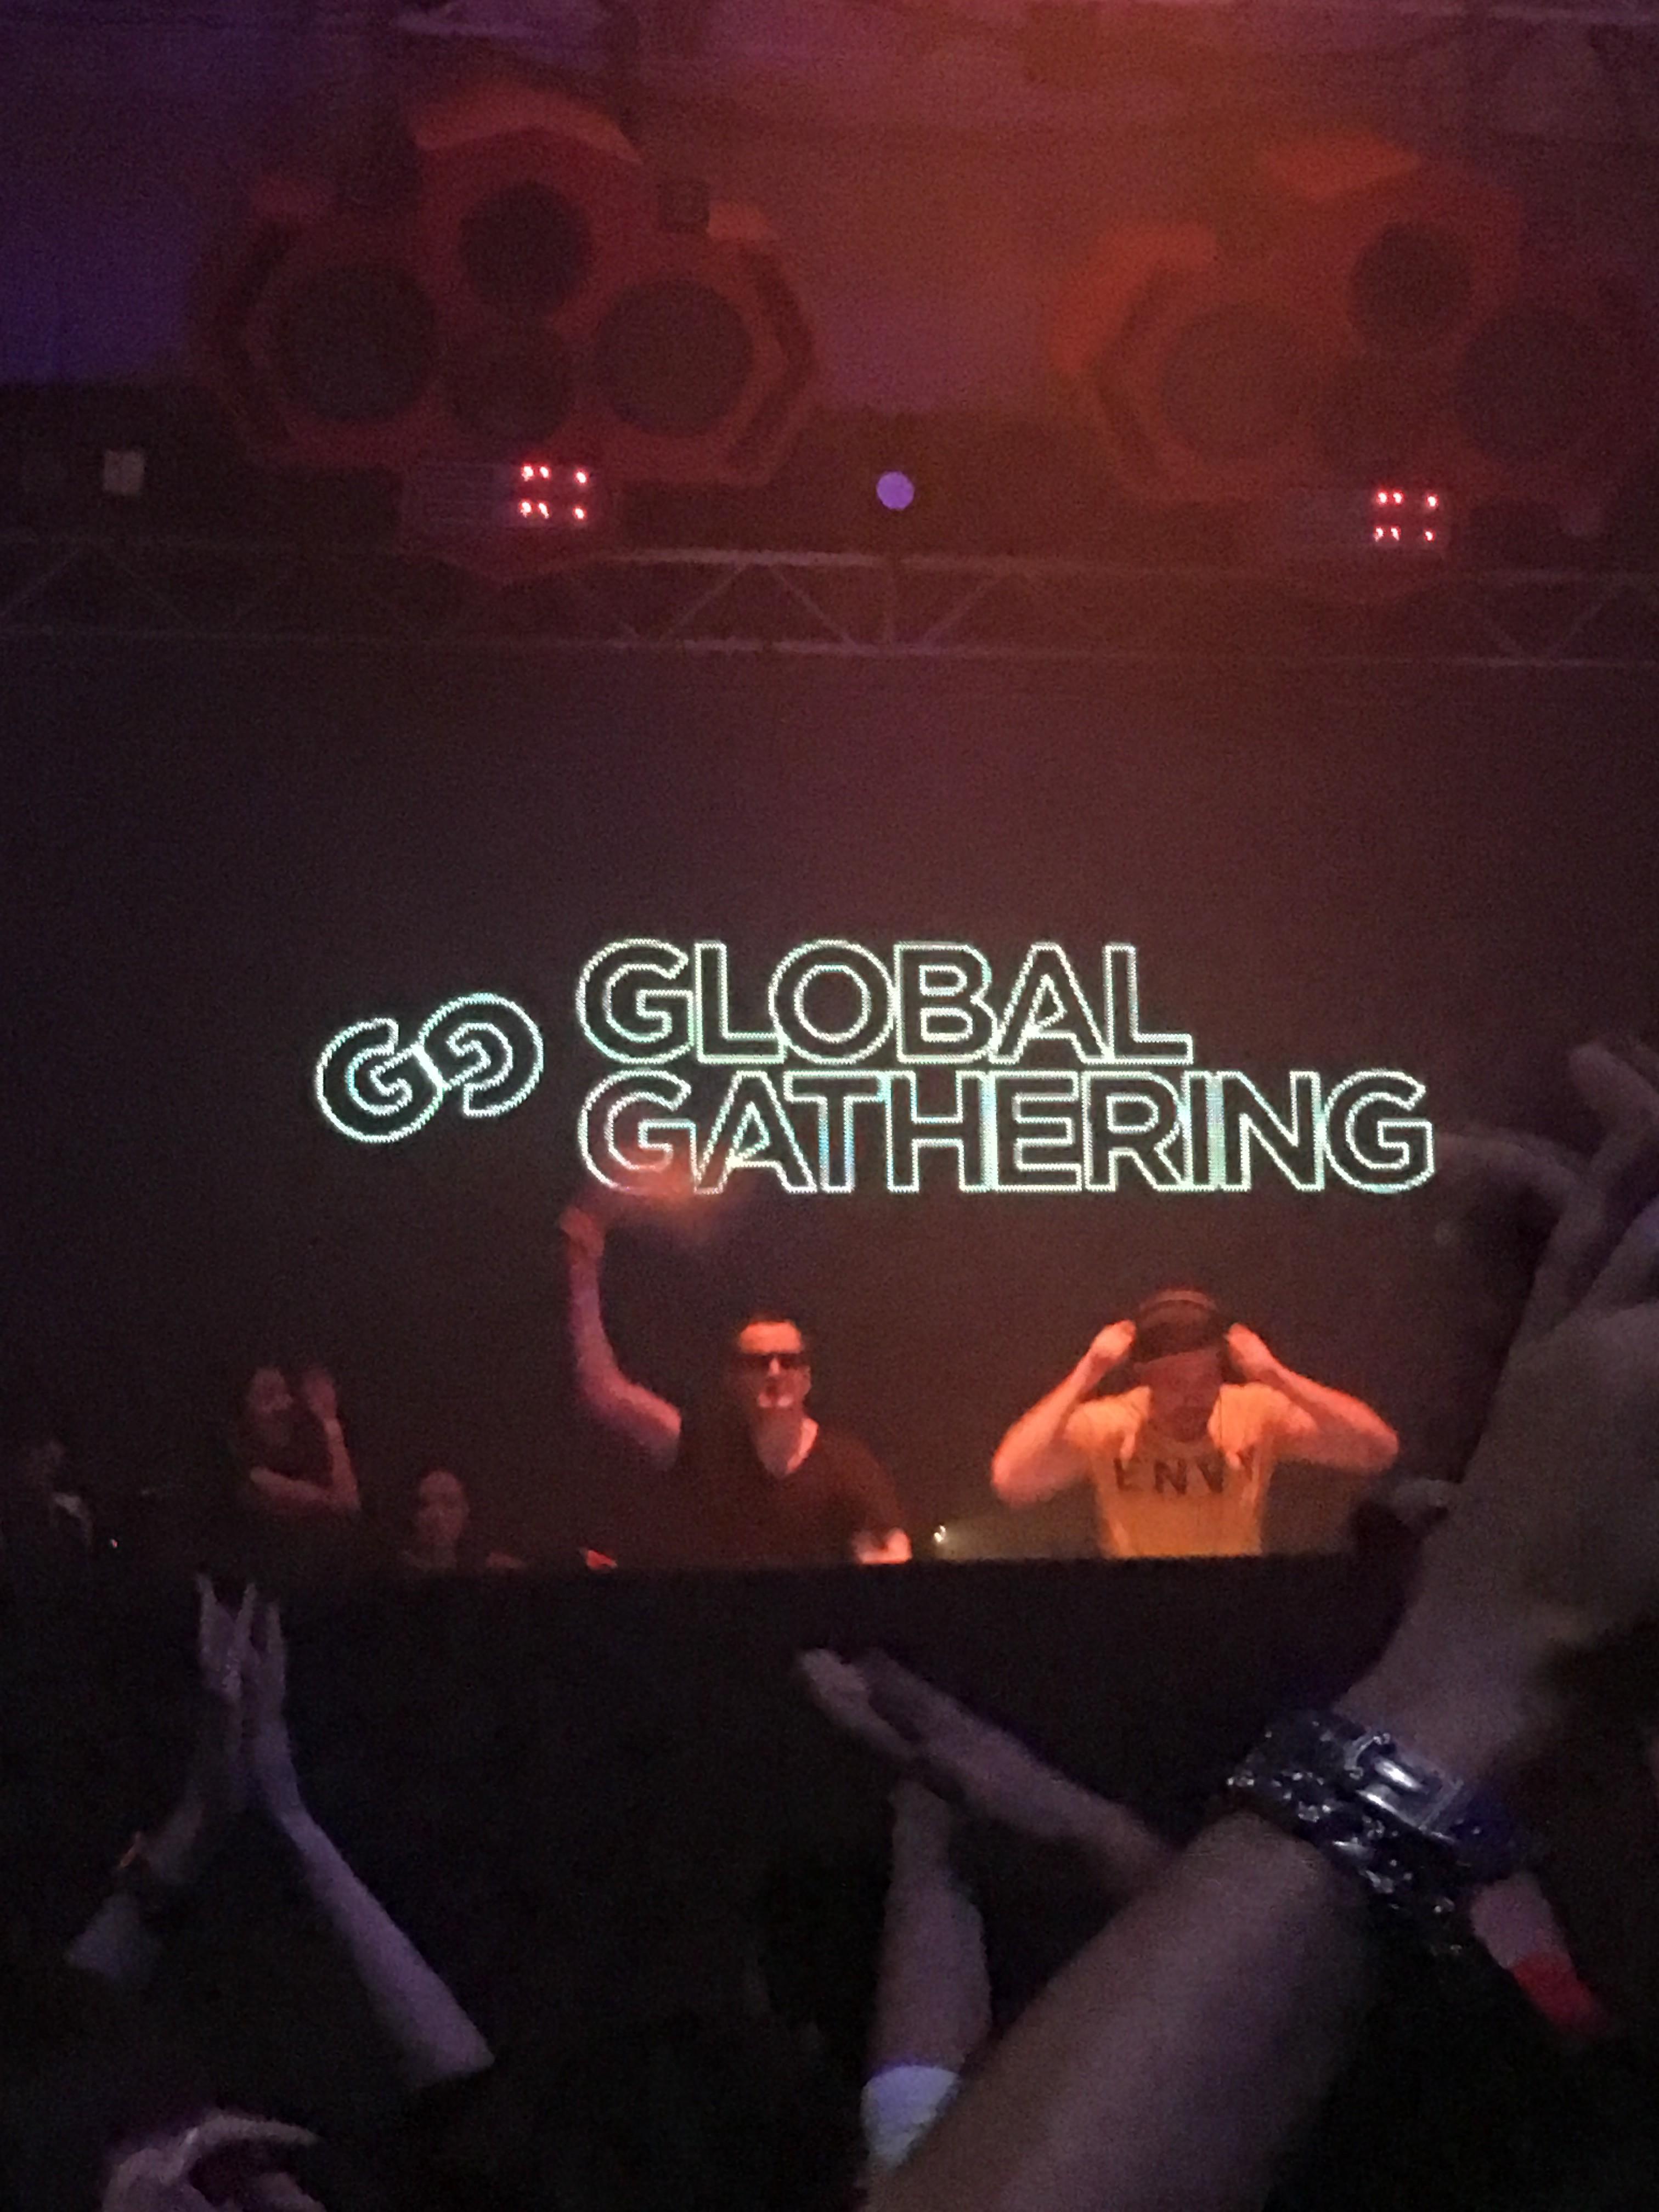 GLOBAL GATHERING 20151128